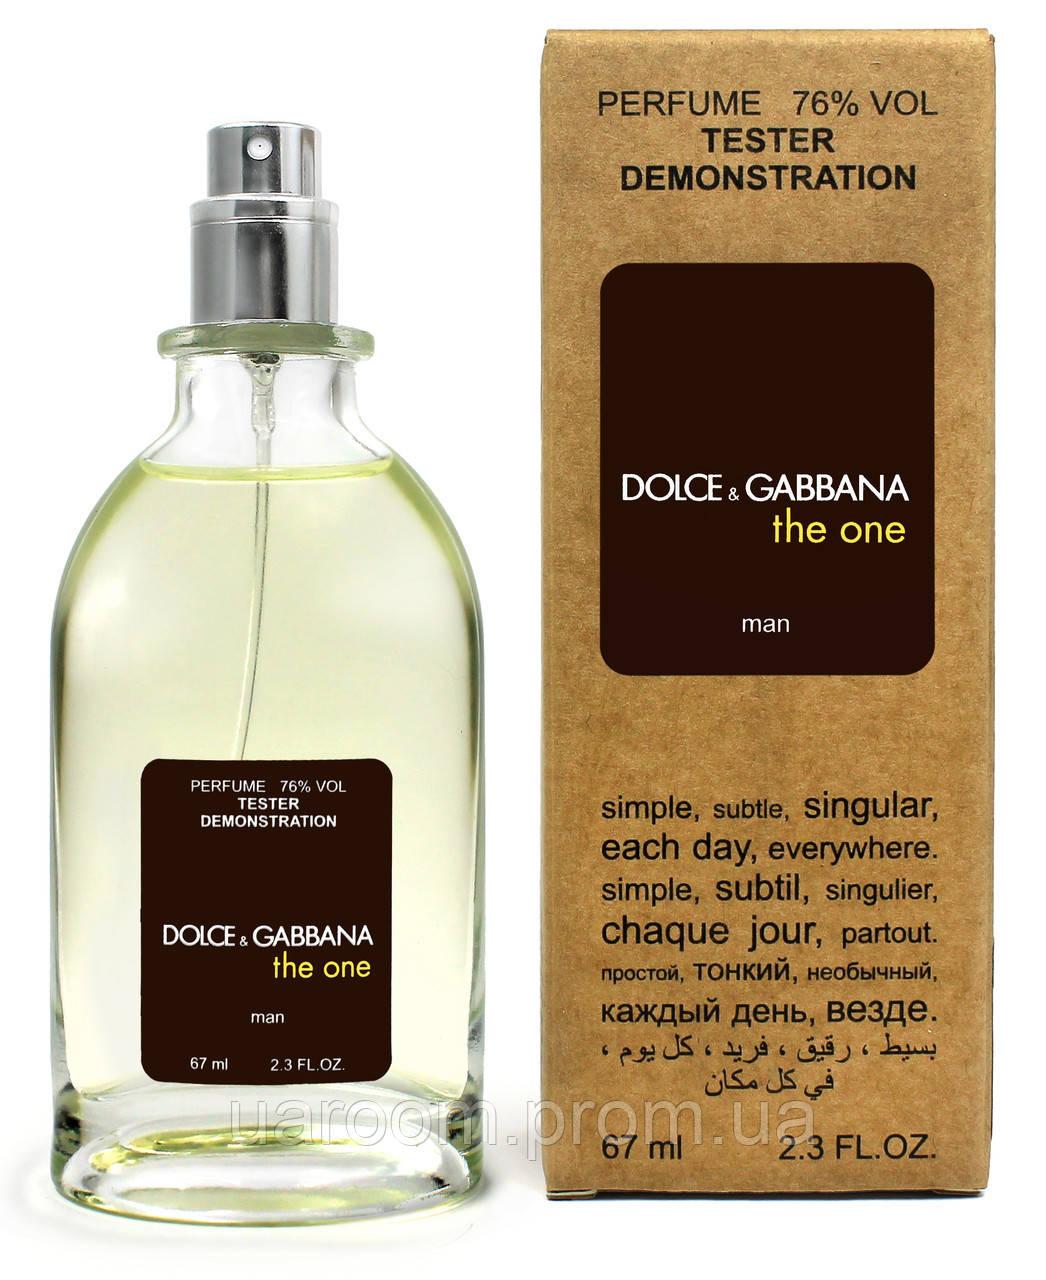 Тестер чоловічий Dolce&Gabbana The One For Men 67 мл